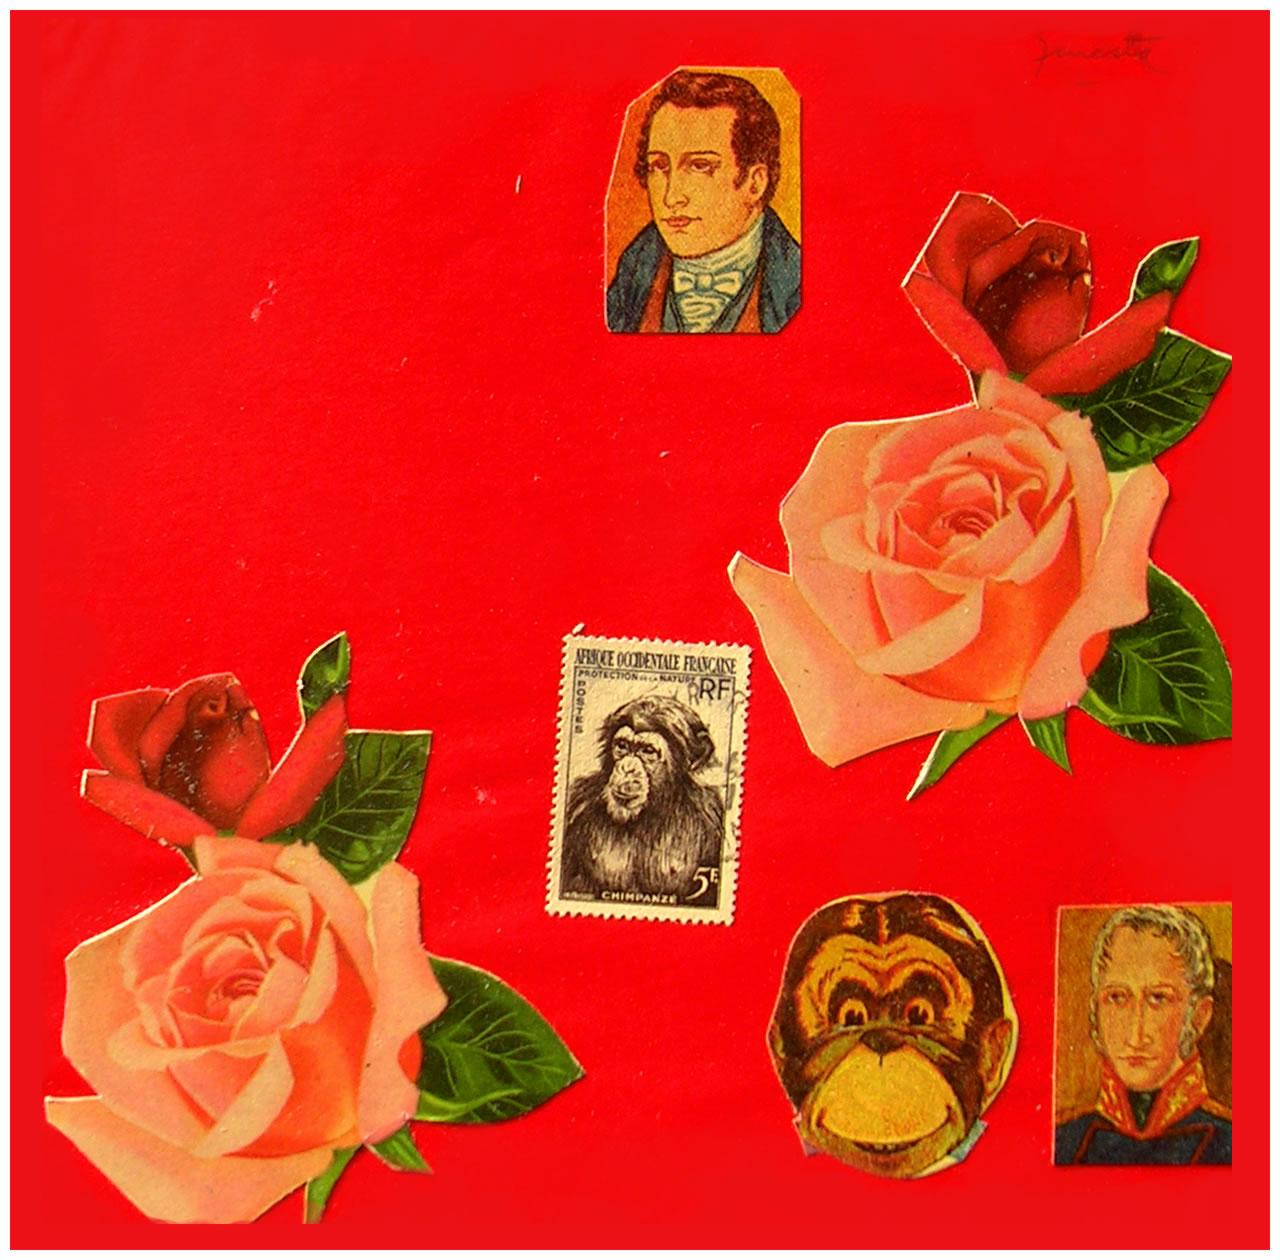 Mariano Moreno,  papel collage, 15 cm x 15 cm, 1999